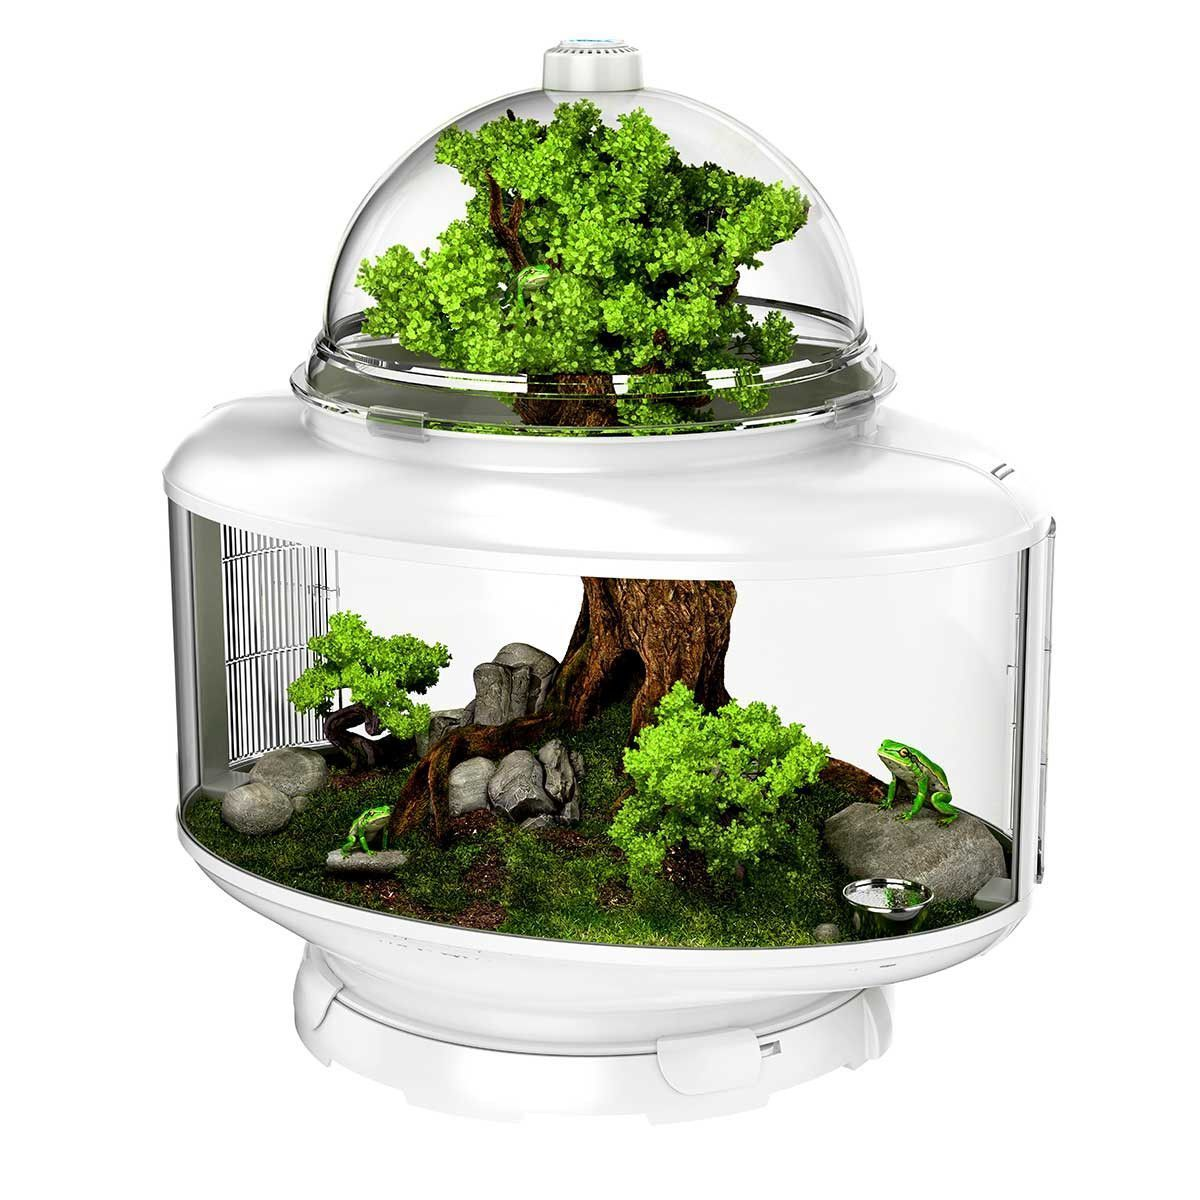 The biobubble terrarium is a groundbreaking habitat that introduces